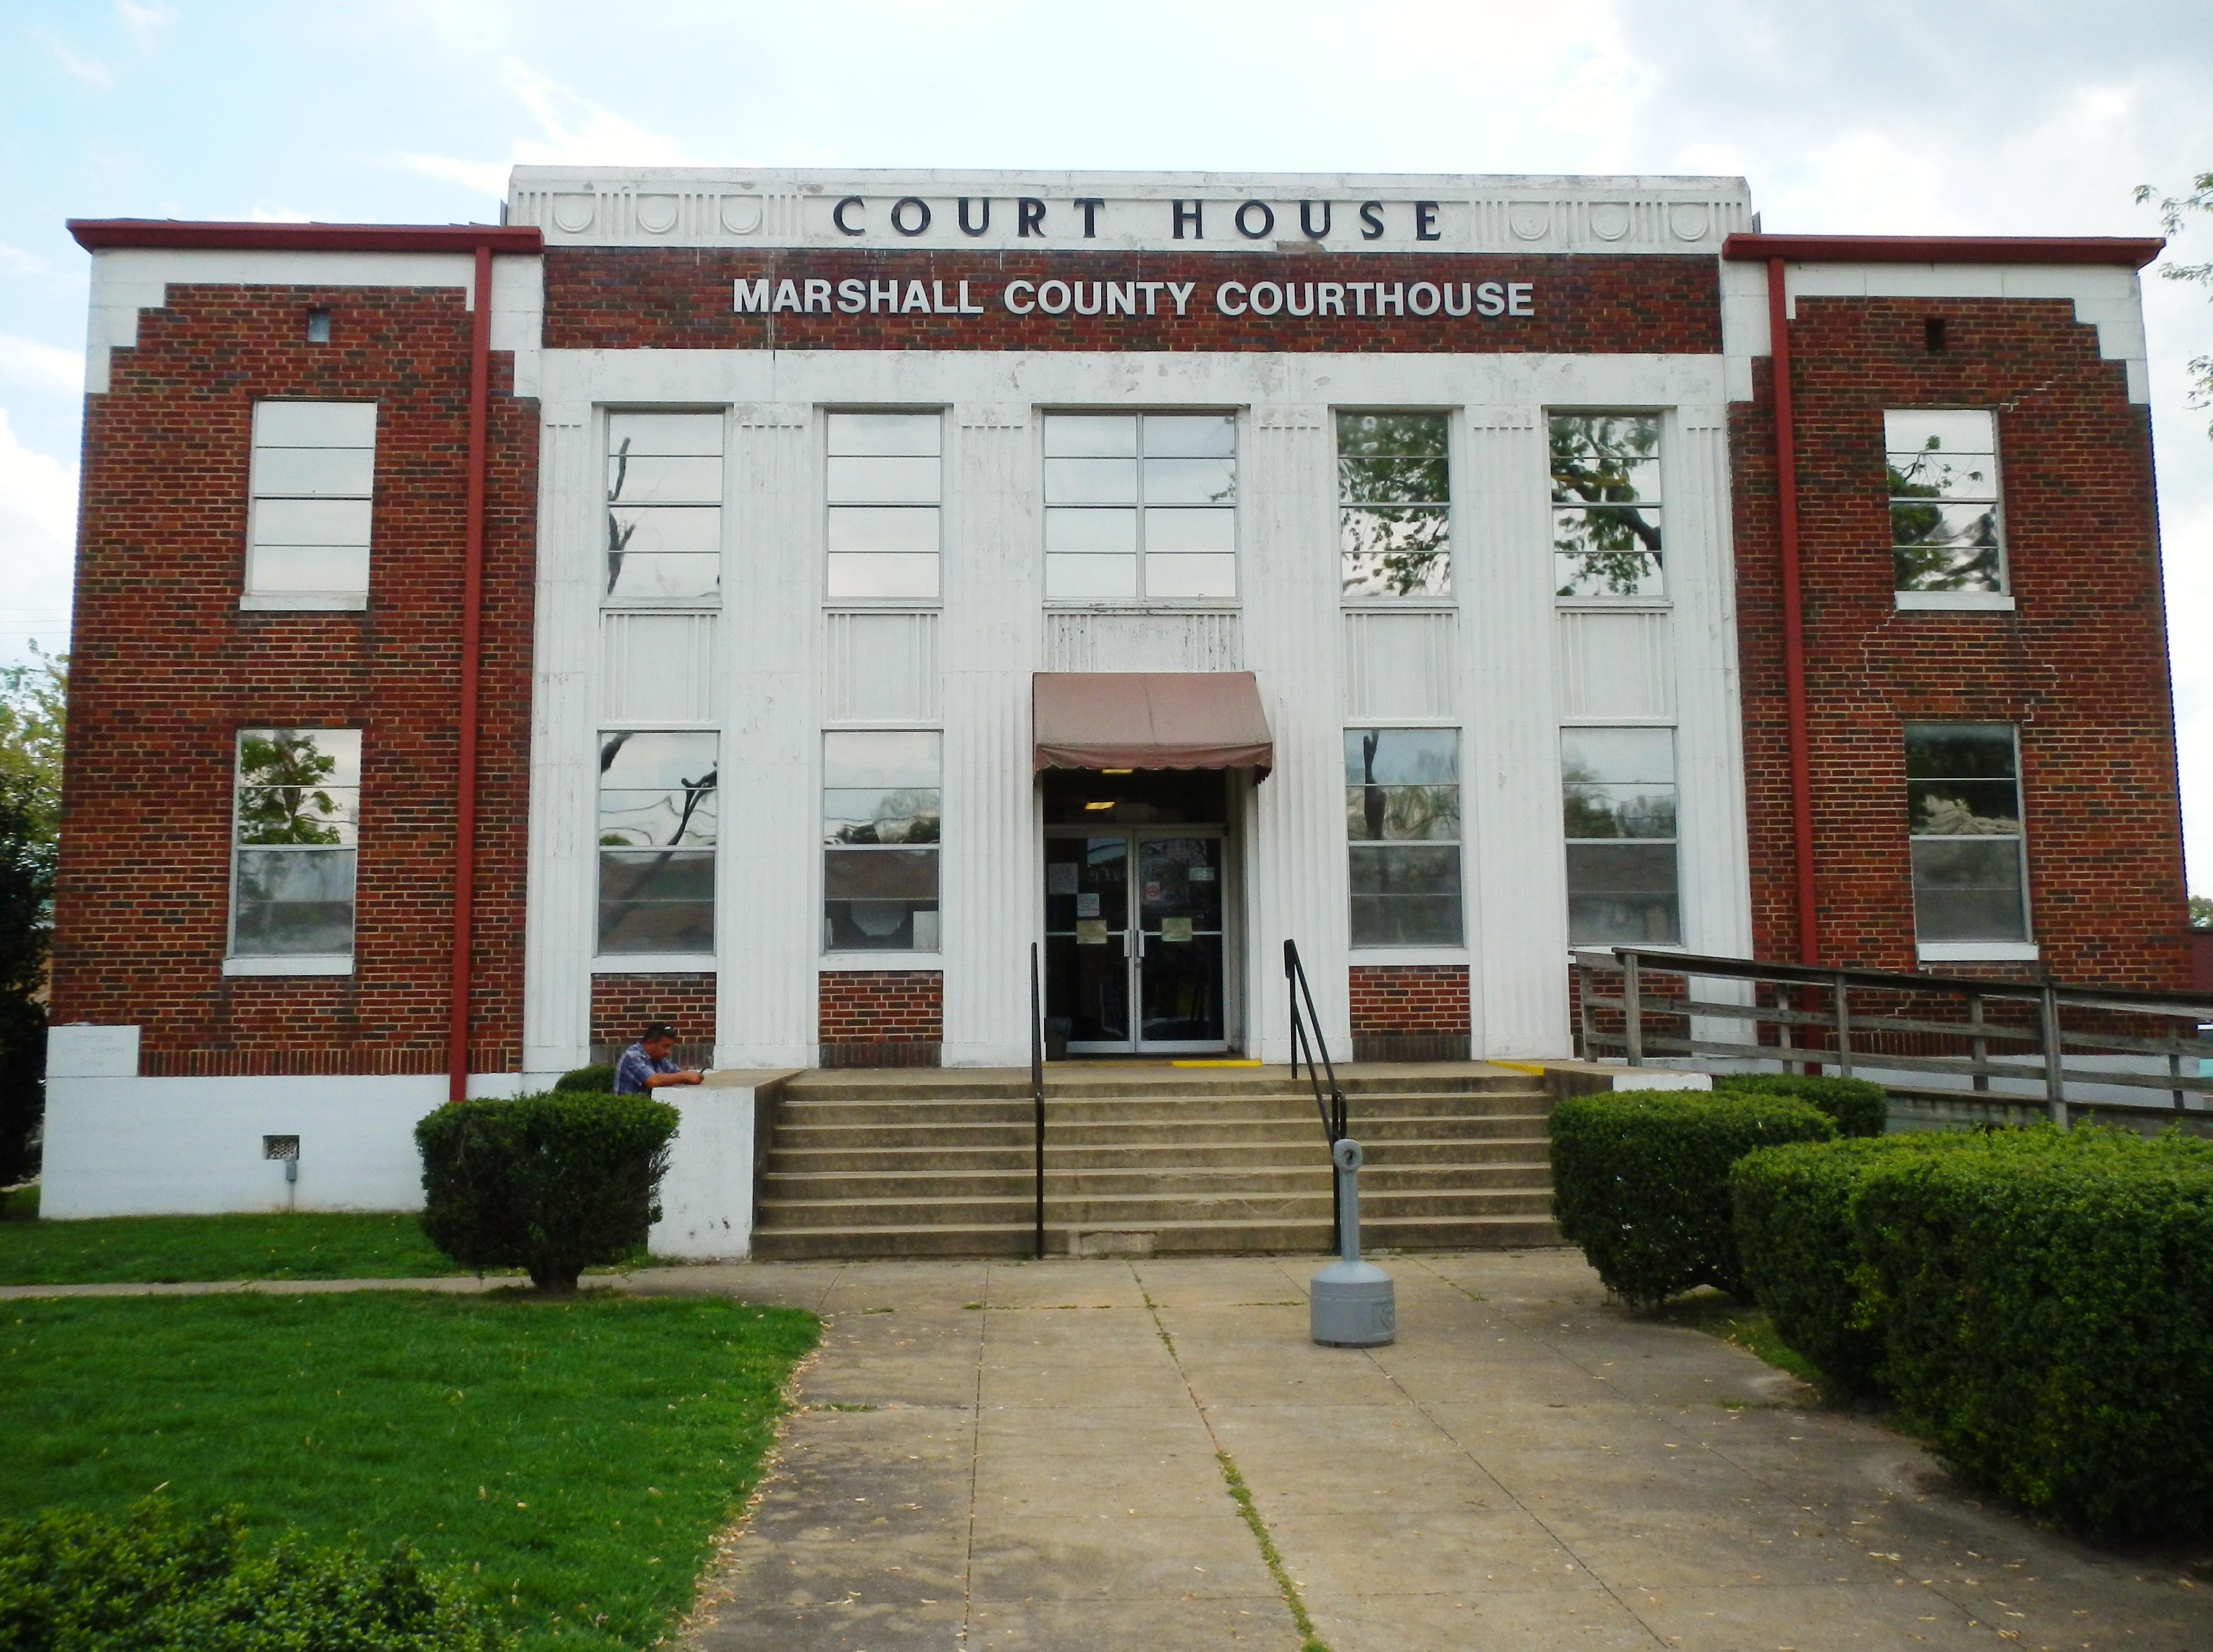 File:Marshall County, Alabama Courthouse.JPG - Wikimedia Commonsbalance of marshall county